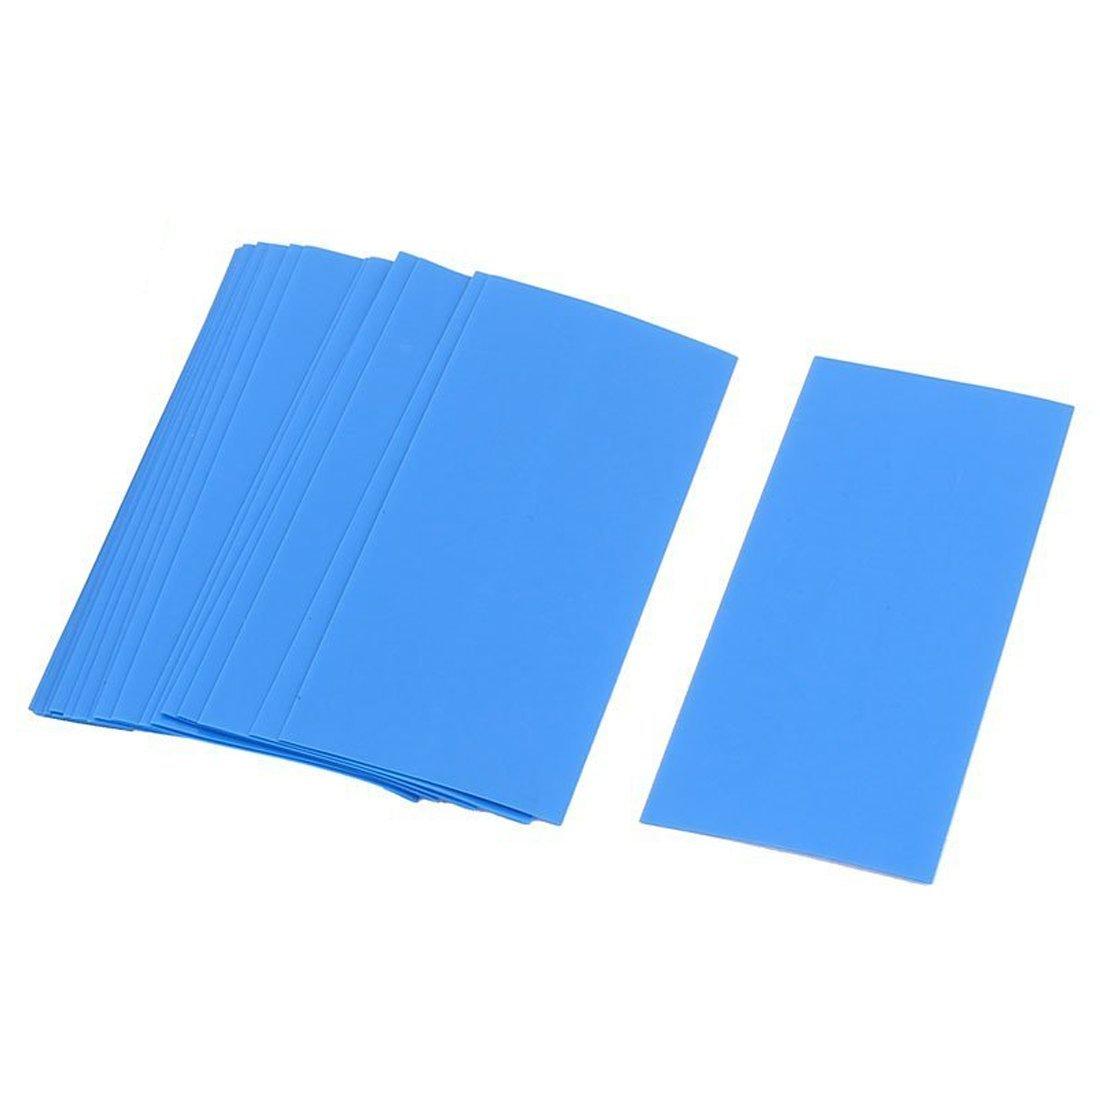 SODIAL(R) 20x 18.5mm Dia PVC Heat Shrink Tubing Blue for 1 x 18650/18500 Battery